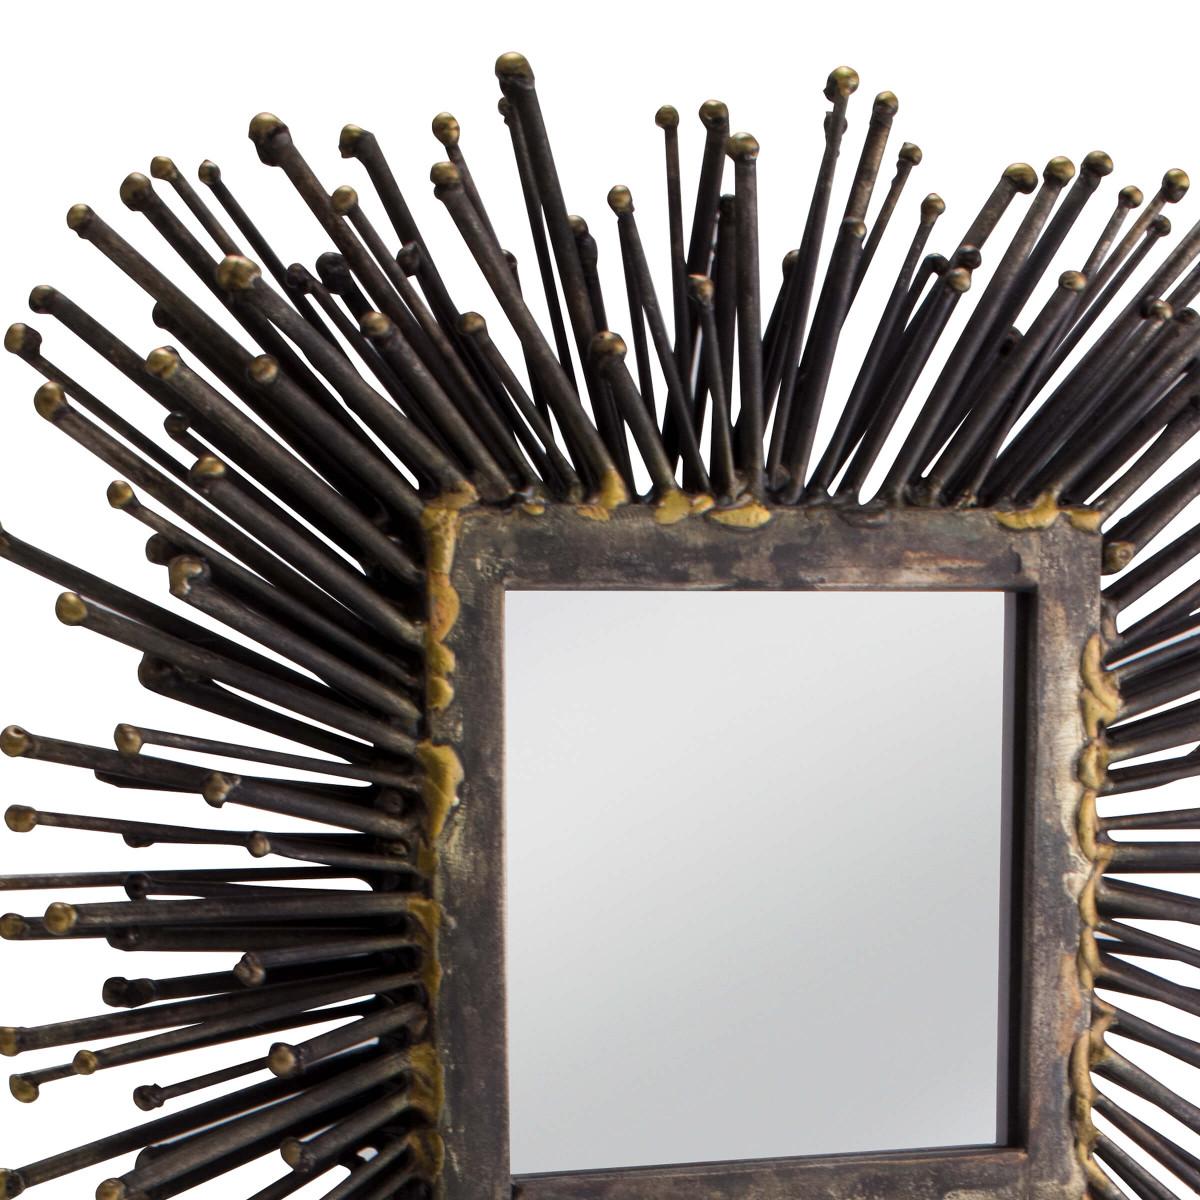 Ursa Starburst Table Mirror | Square